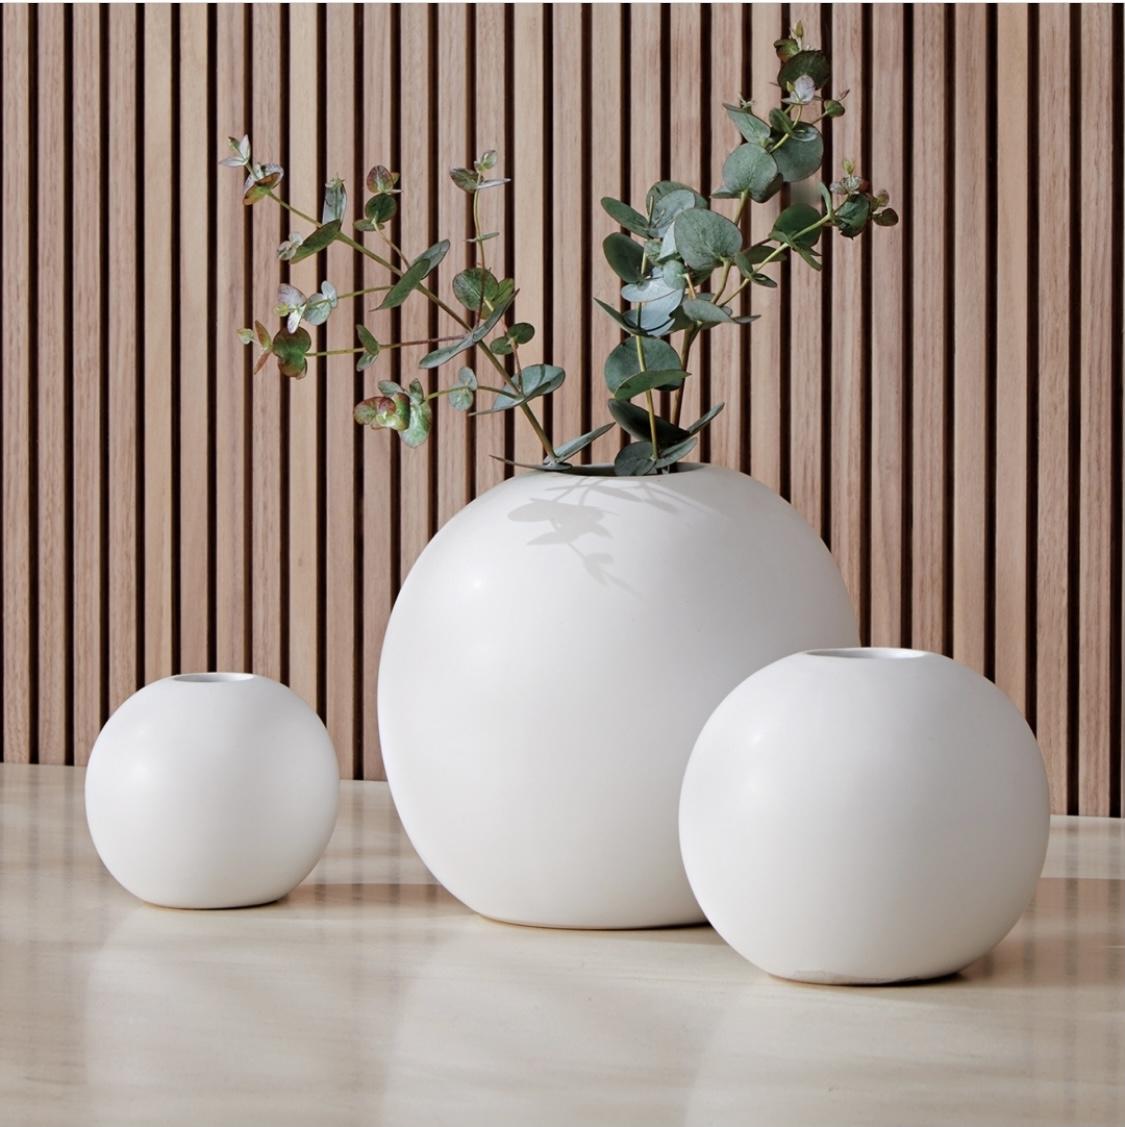 Vaso Bolinha Branco Decorativo Cerâmica M - Mart Collection